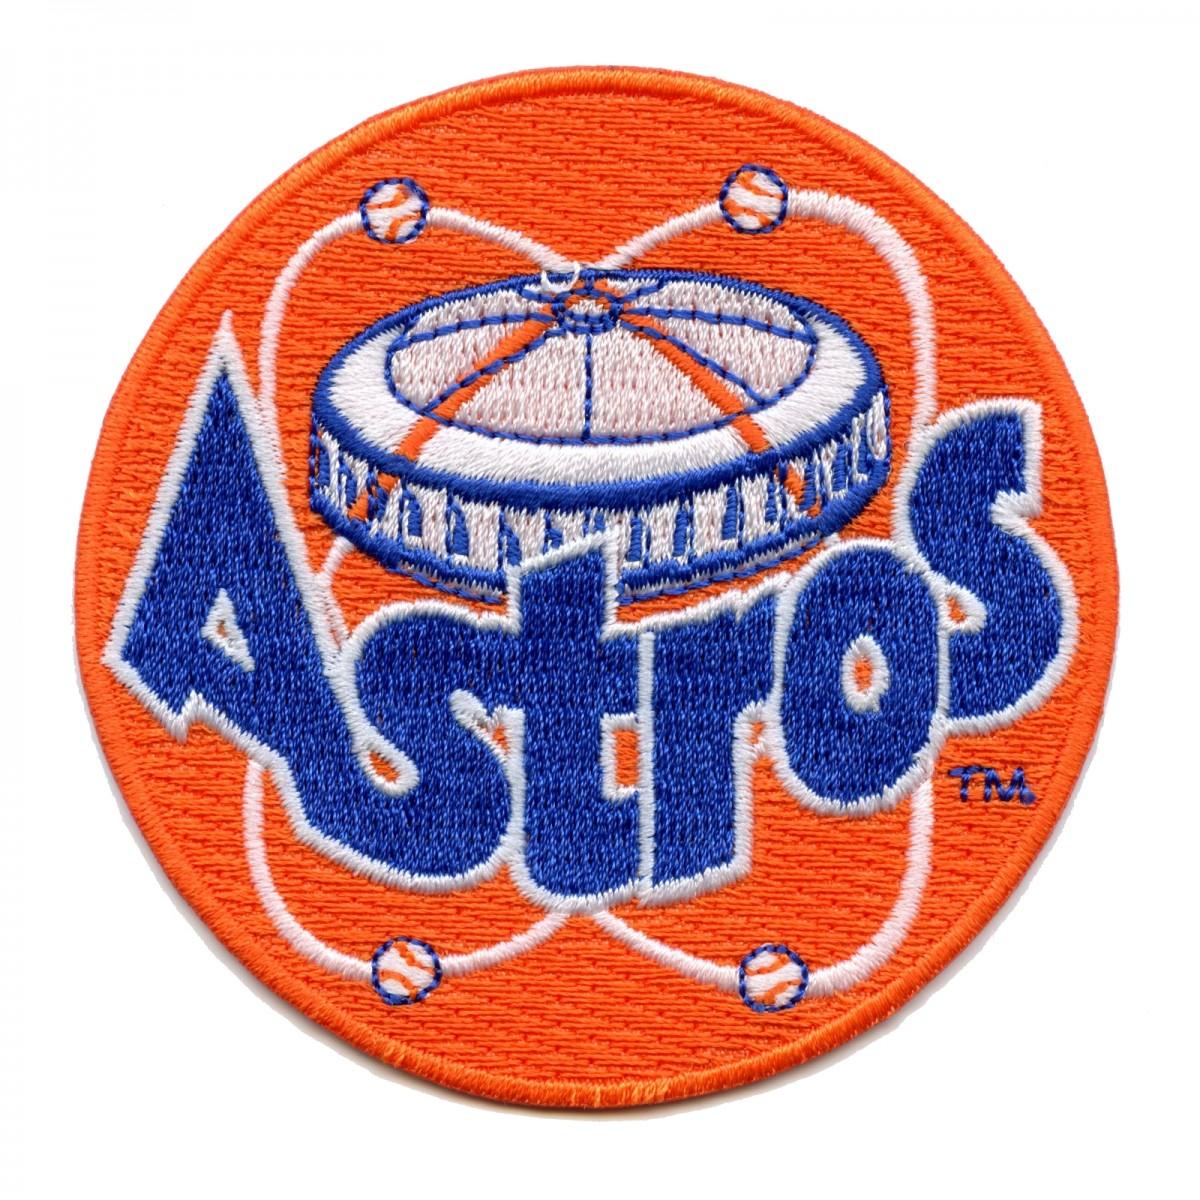 Houston Astros Retro Logo With Astrodome Patch.